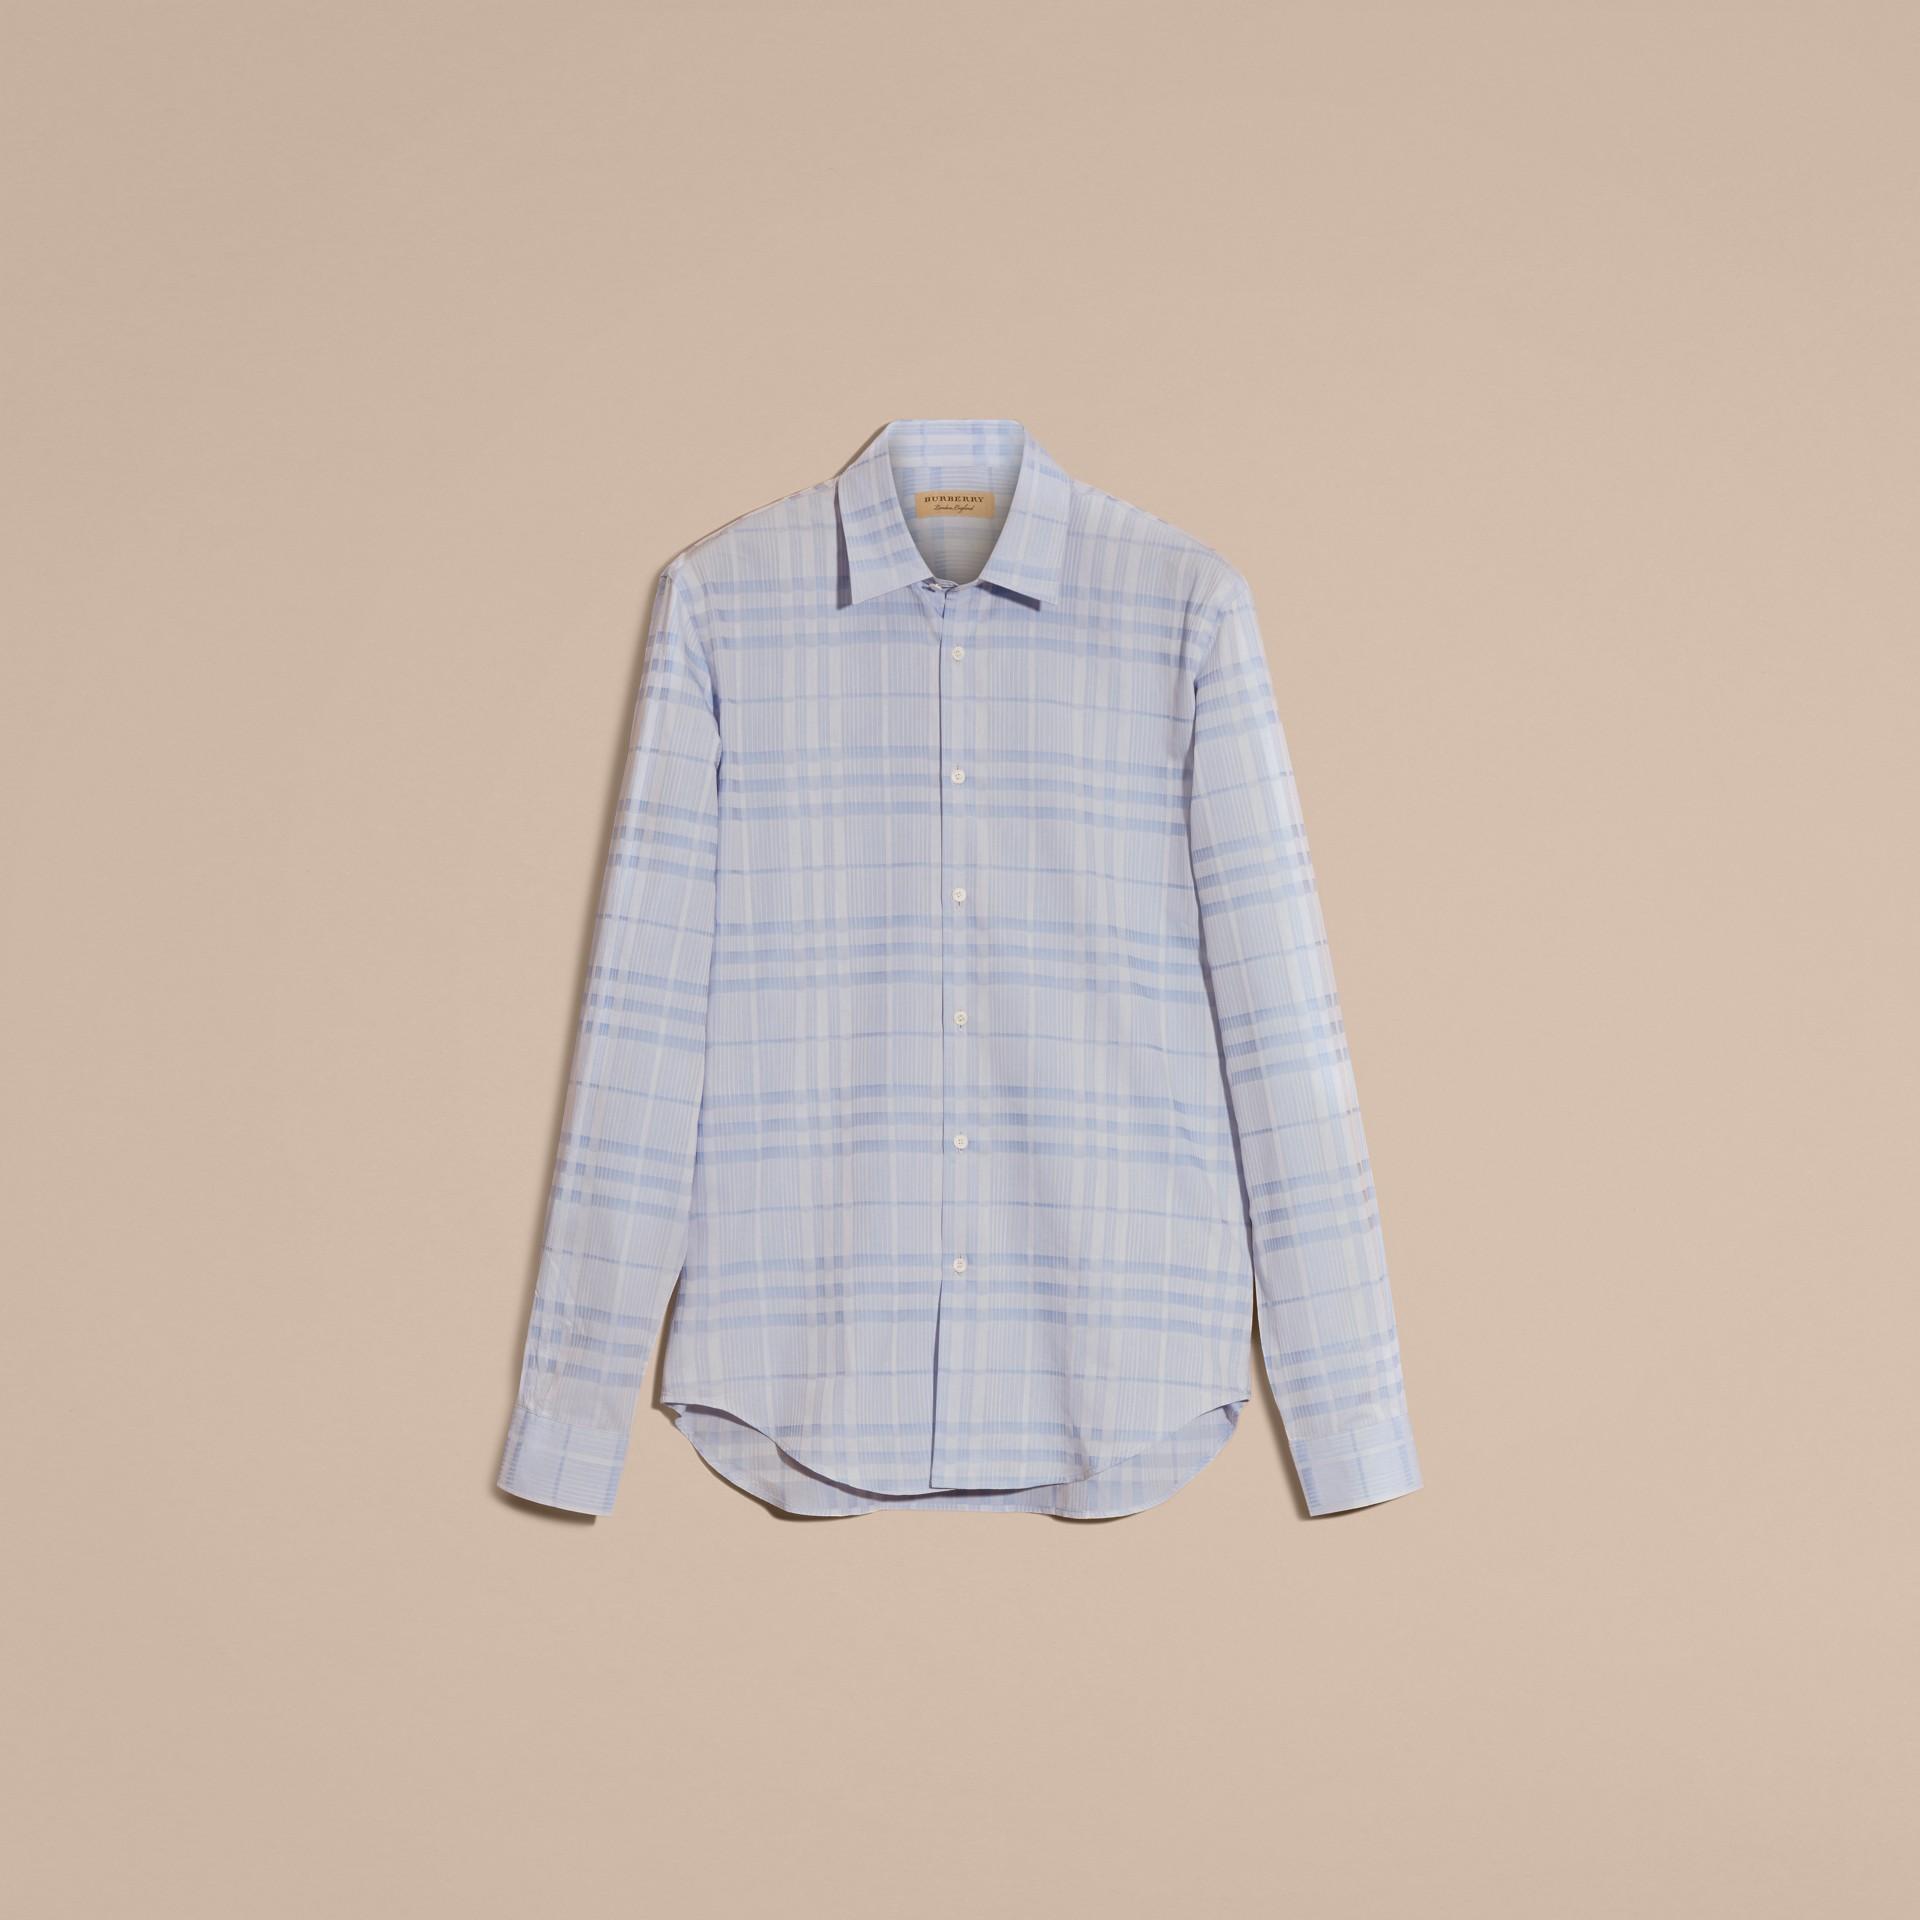 City blue Check Jacquard Cotton Shirt City Blue - gallery image 4